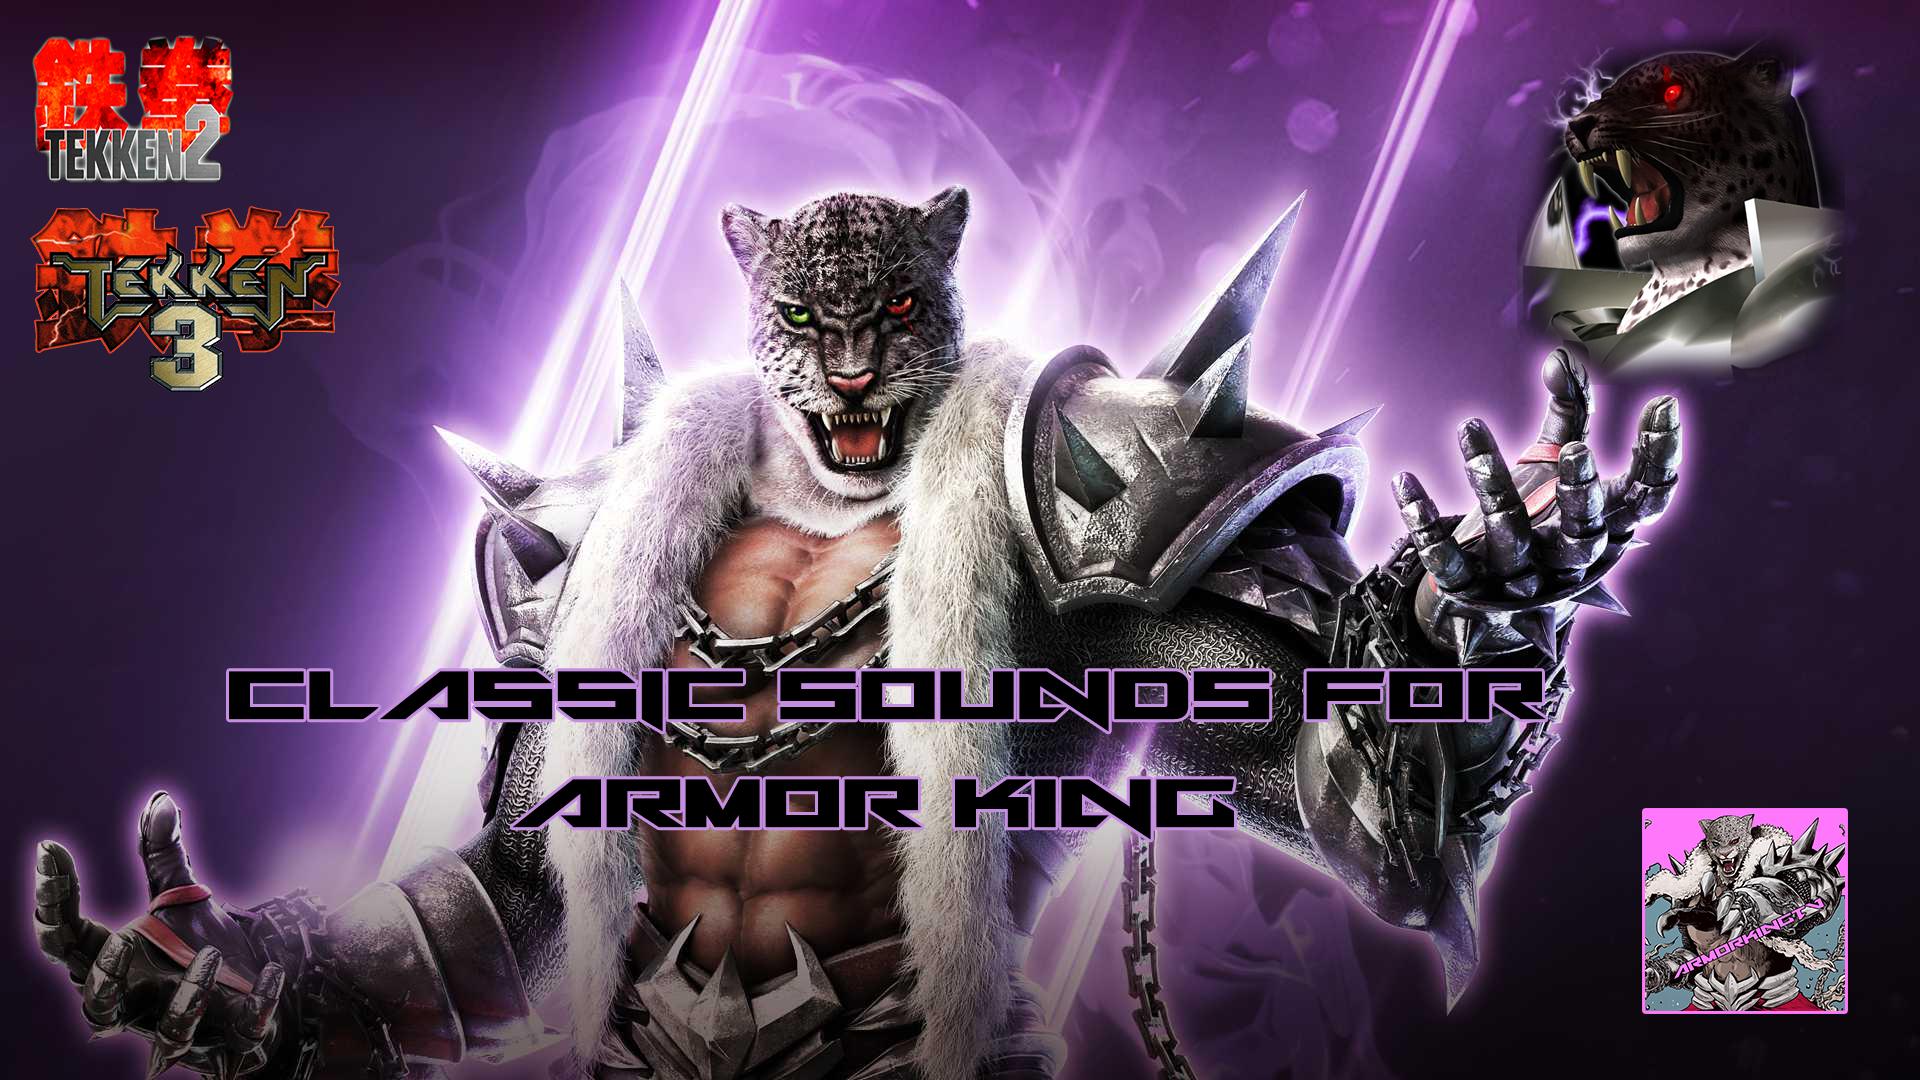 Armor King Classic Sounds Mod For Tekken 7 By Armorkingtv21 On Deviantart